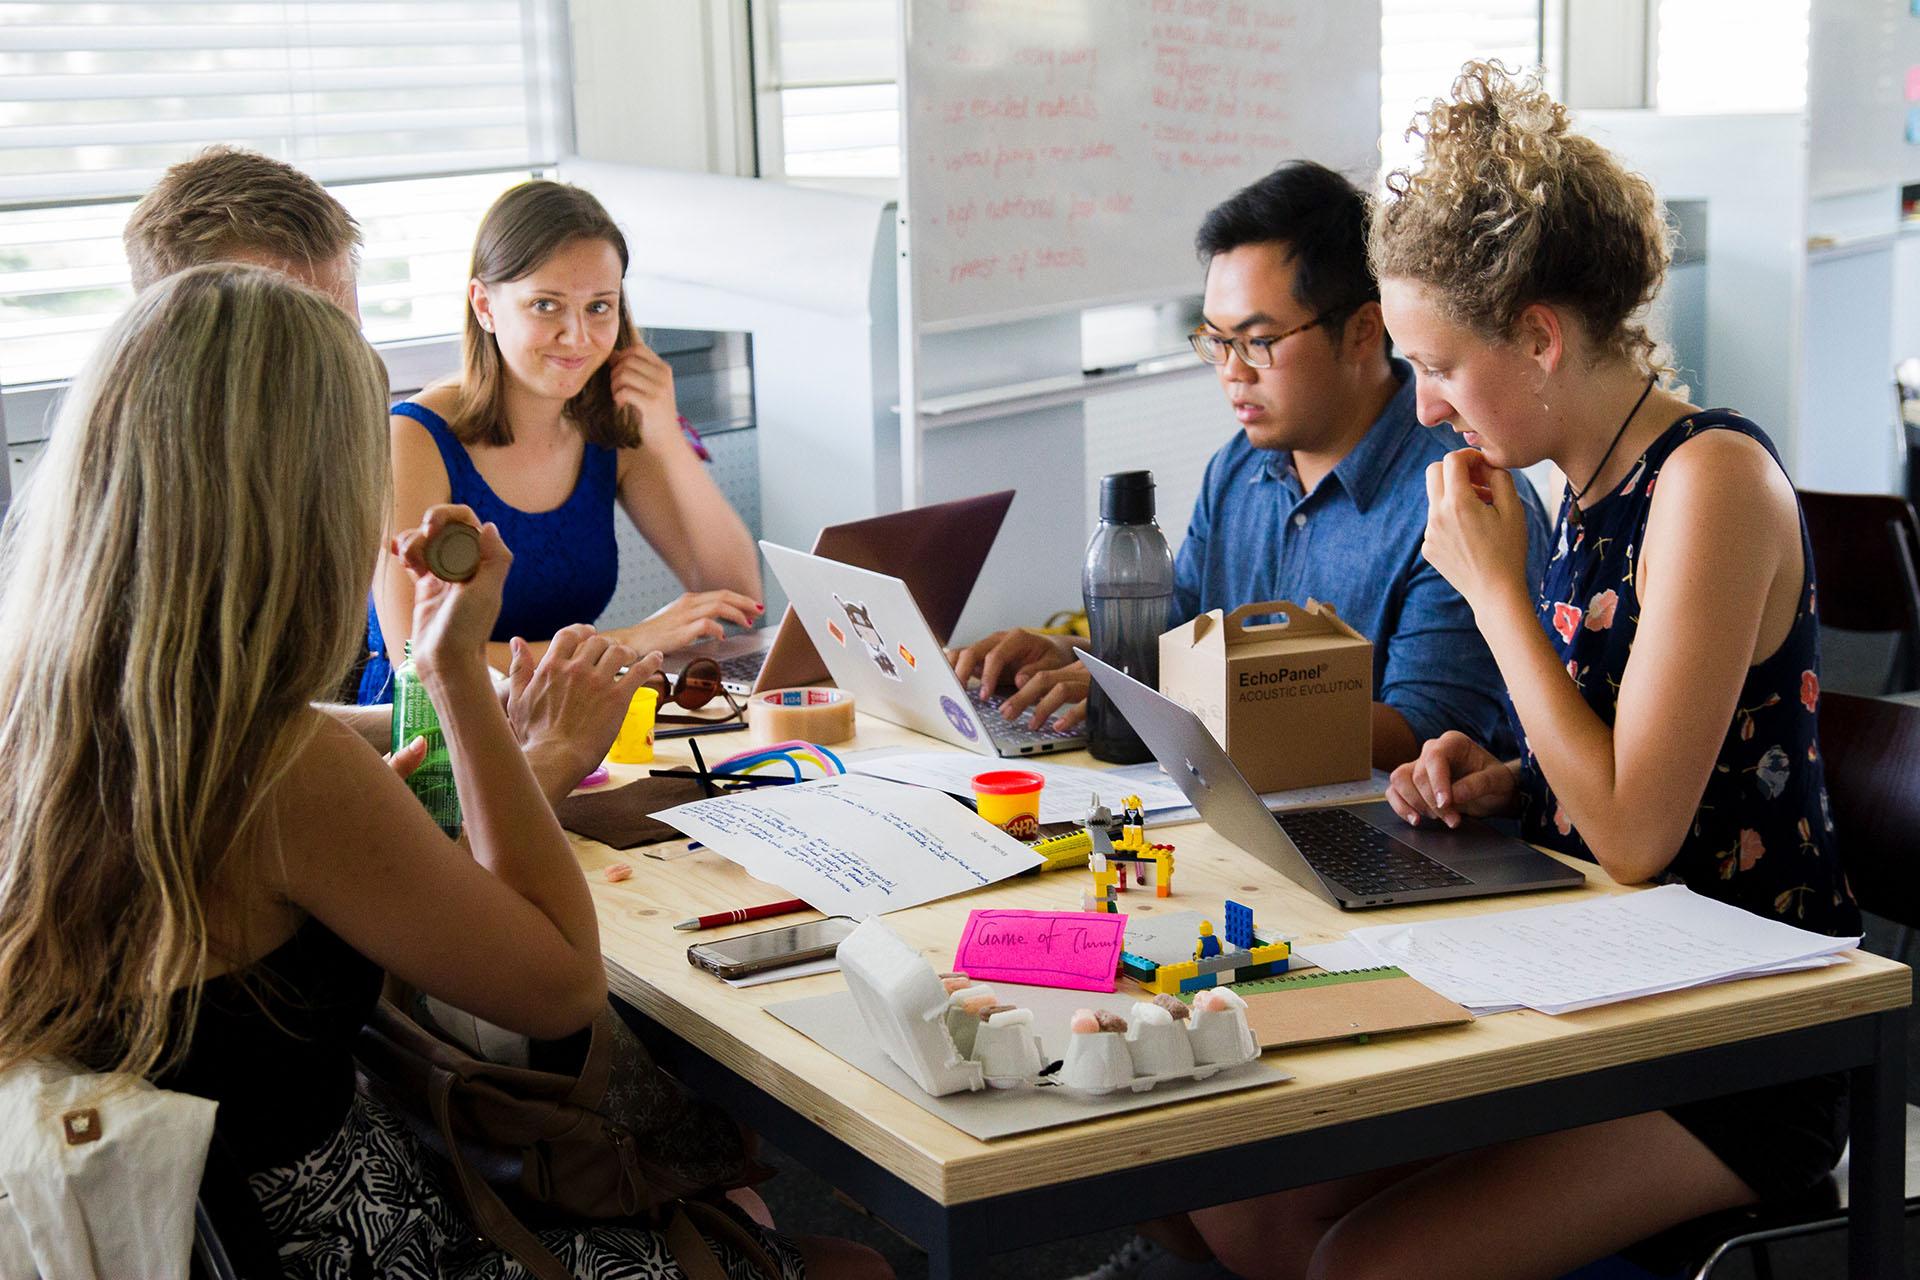 Crowdfunding, come strutturare i contenuti essenziali di una campagna | DeRev Academy #11